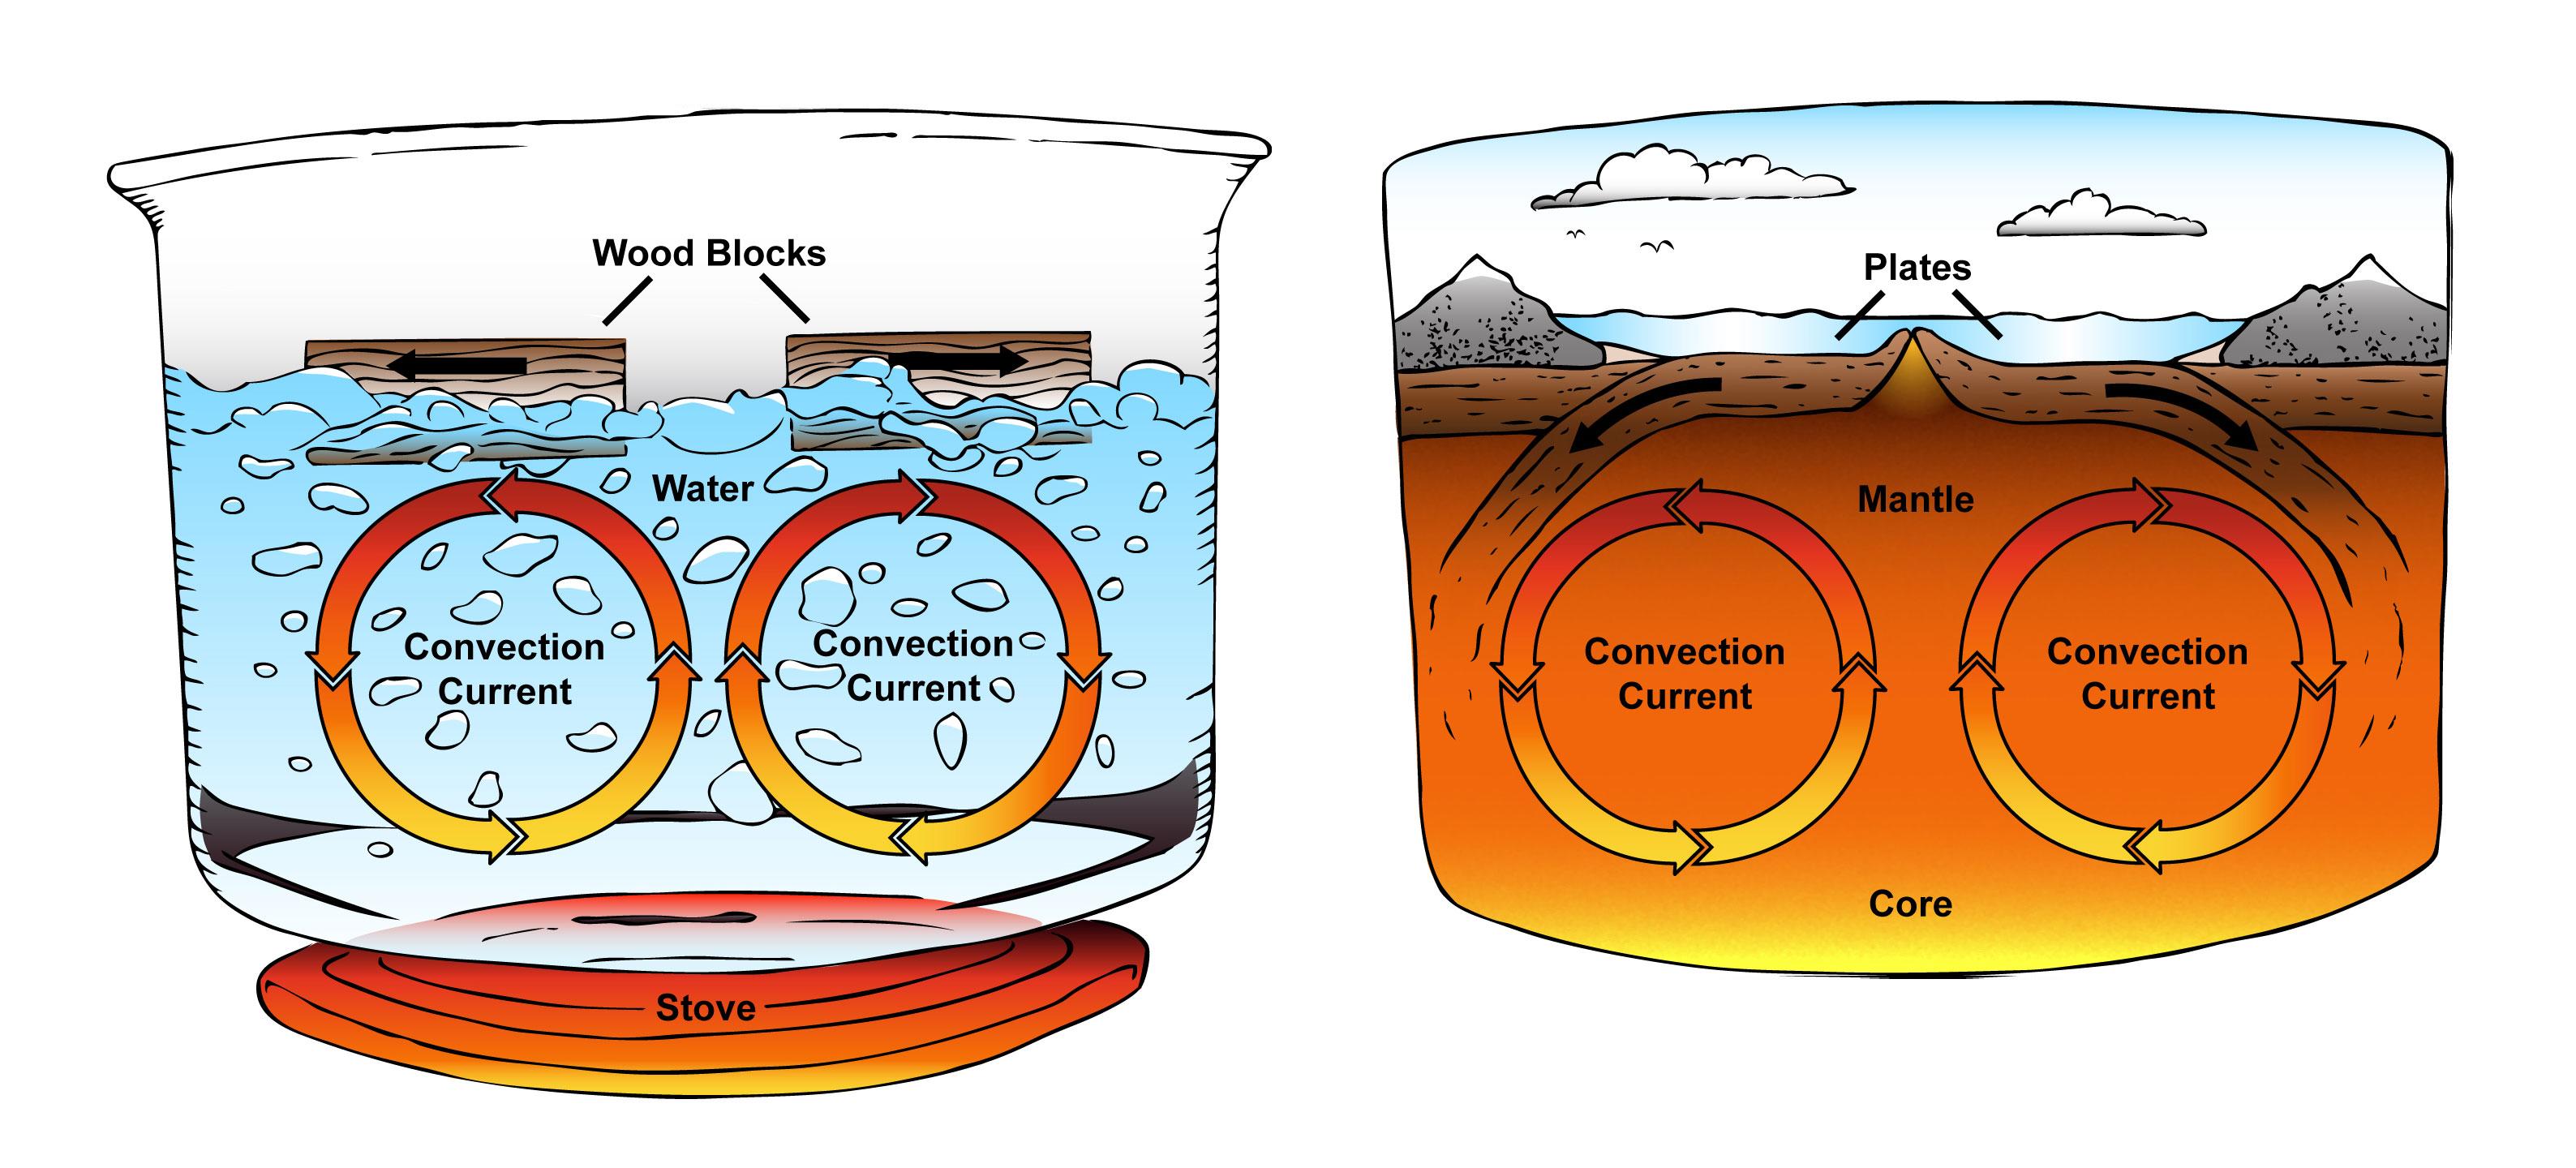 Plate tectonics and layers